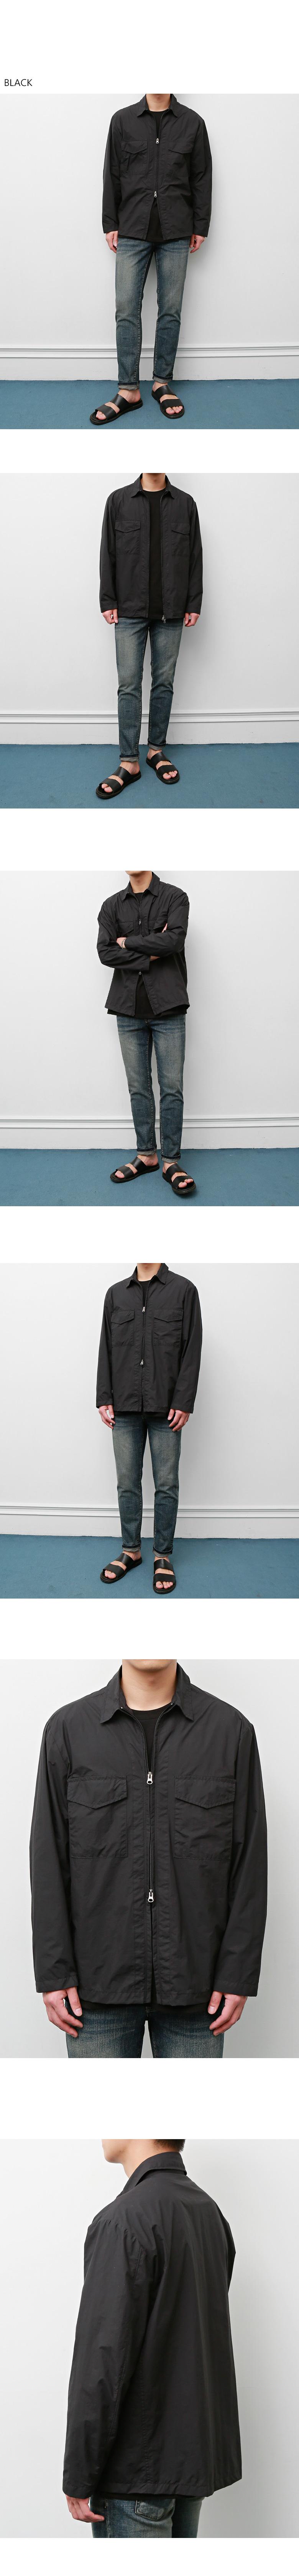 02_fitting_black.jpg